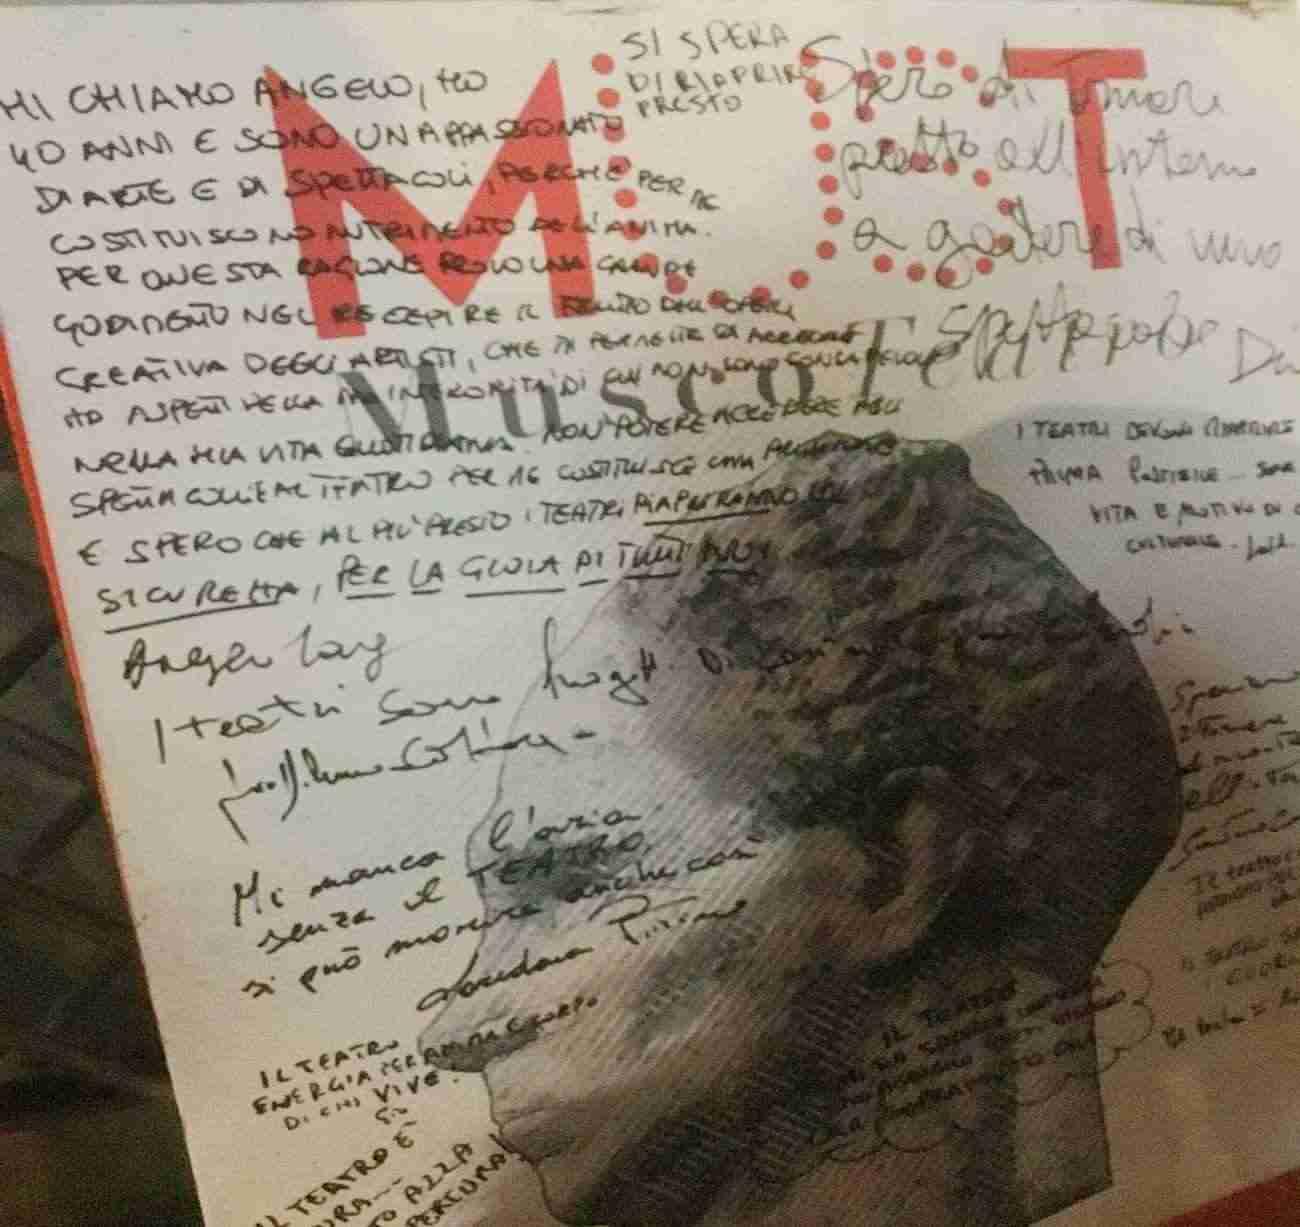 Teatro Angelo Musco Catania, protesta del 22 febbraio 2021